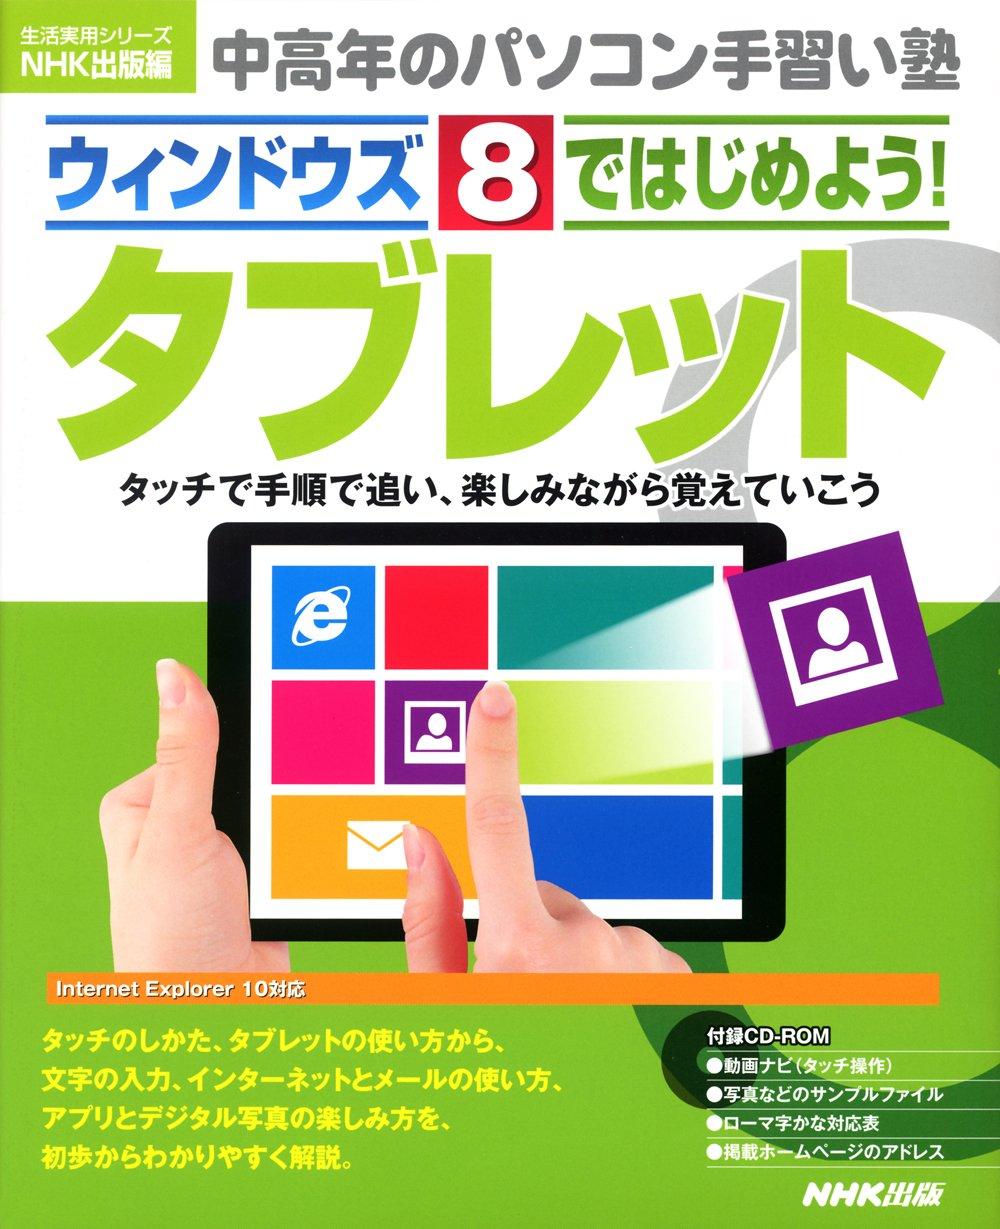 Download Windōzu 8 de hajimeyō! taburetto : tatchi de tejun o oi, tanoshiminagara oboete ikō ebook